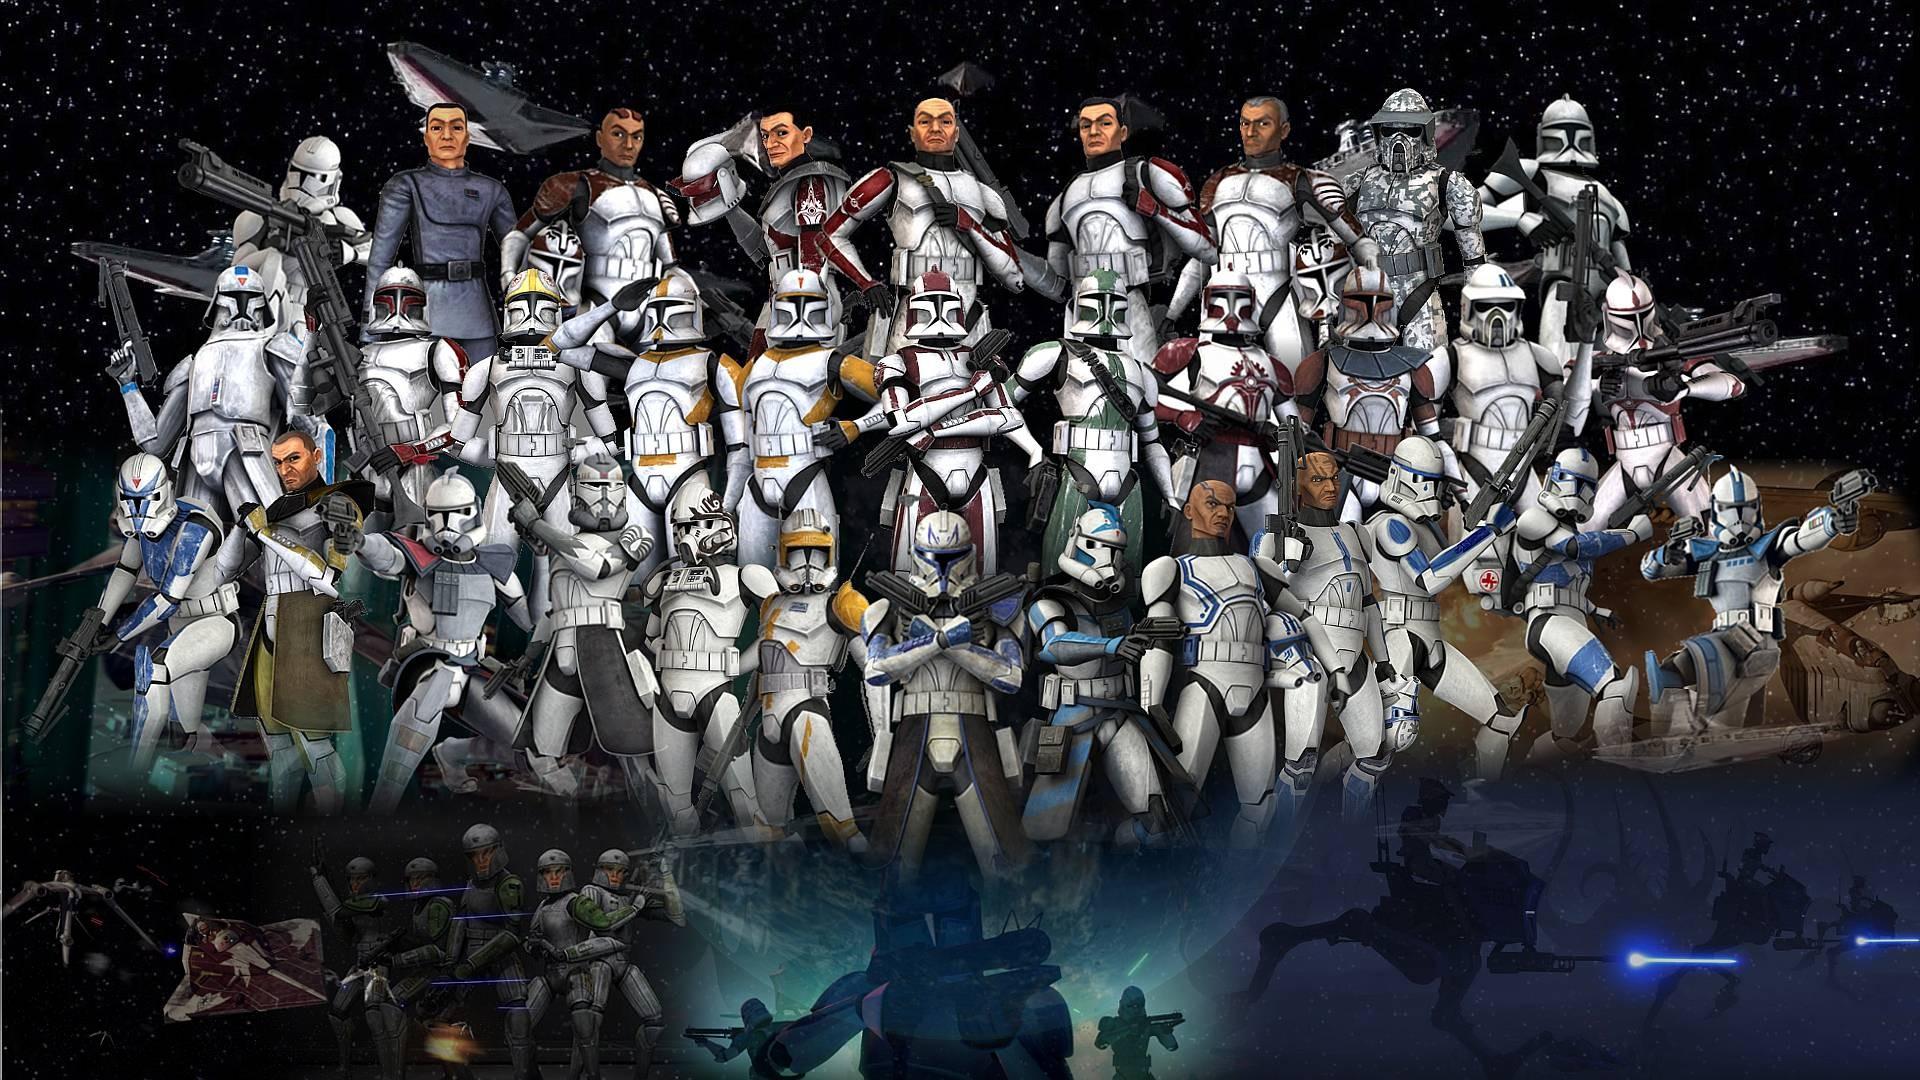 Clone Trooper Wallpaper Download Free Full Hd